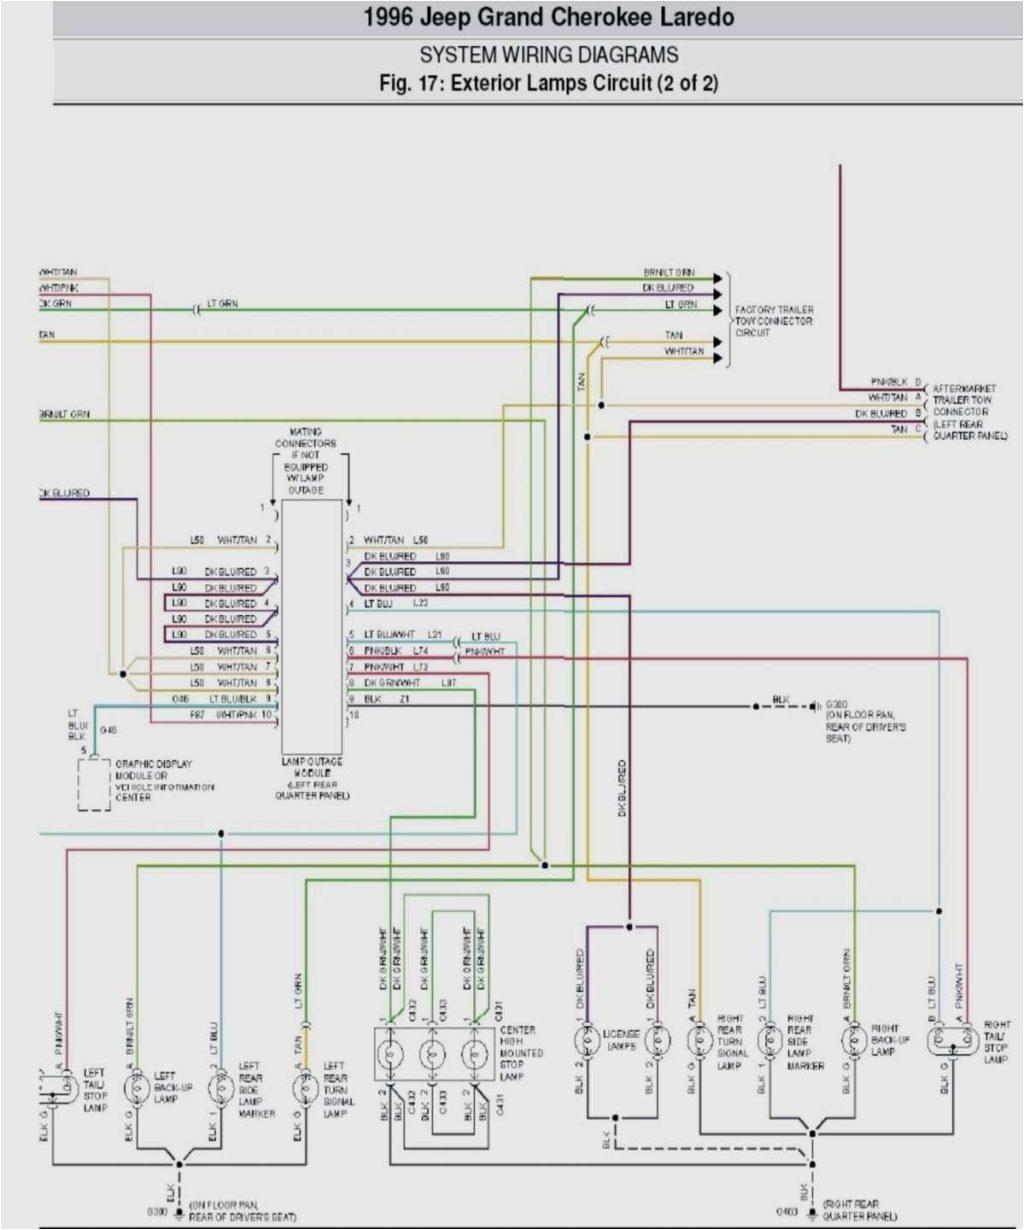 splendi fuse diagram for jeep commander photo ideas kia borrego mpg car reviews consumer reports firing order picture frame 1024x1230 jpg